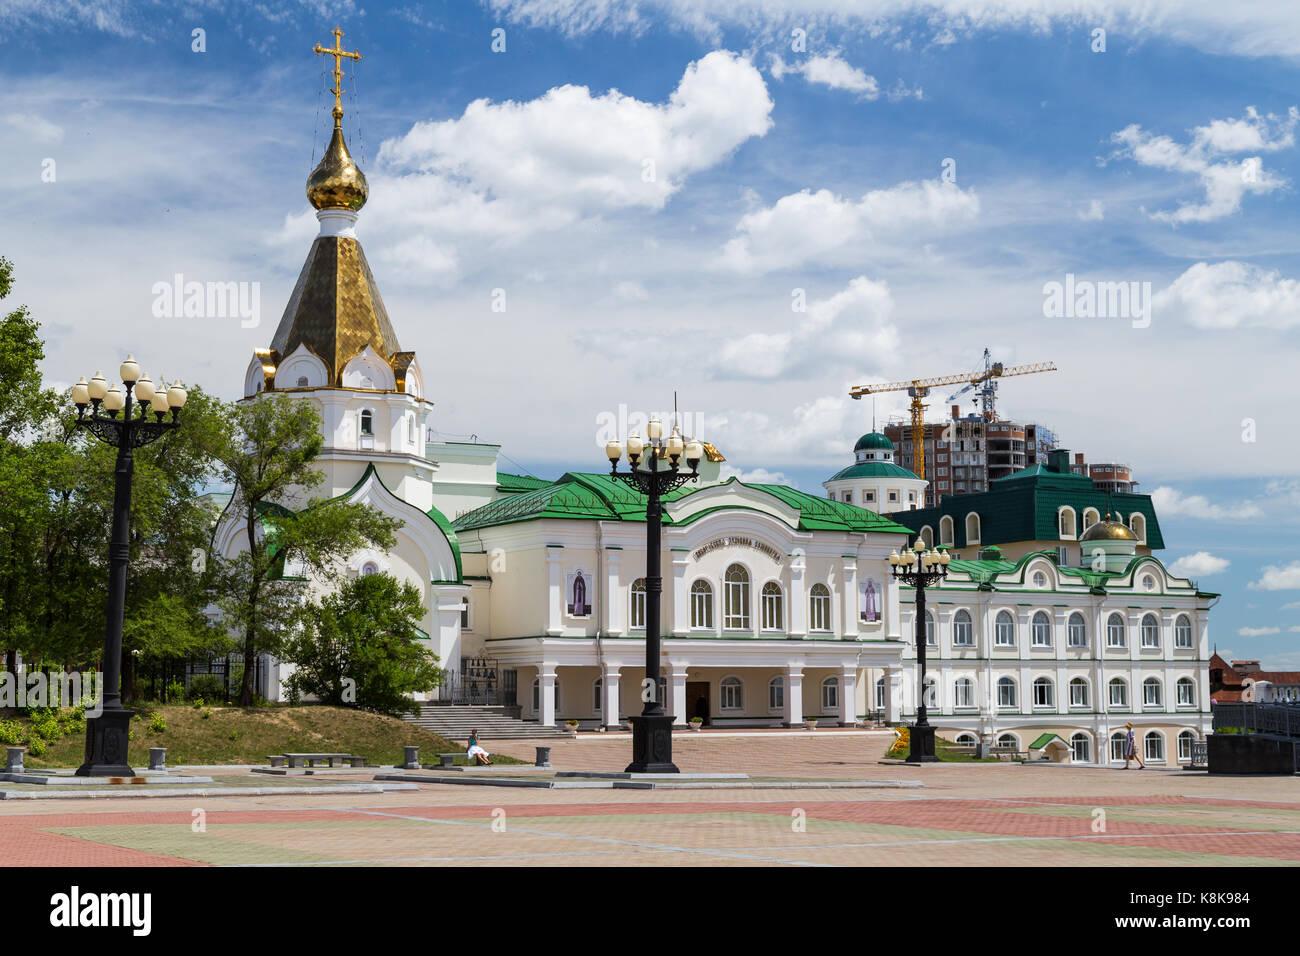 Russian Orhodox Church in Khabarovsk, Russia - Stock Image